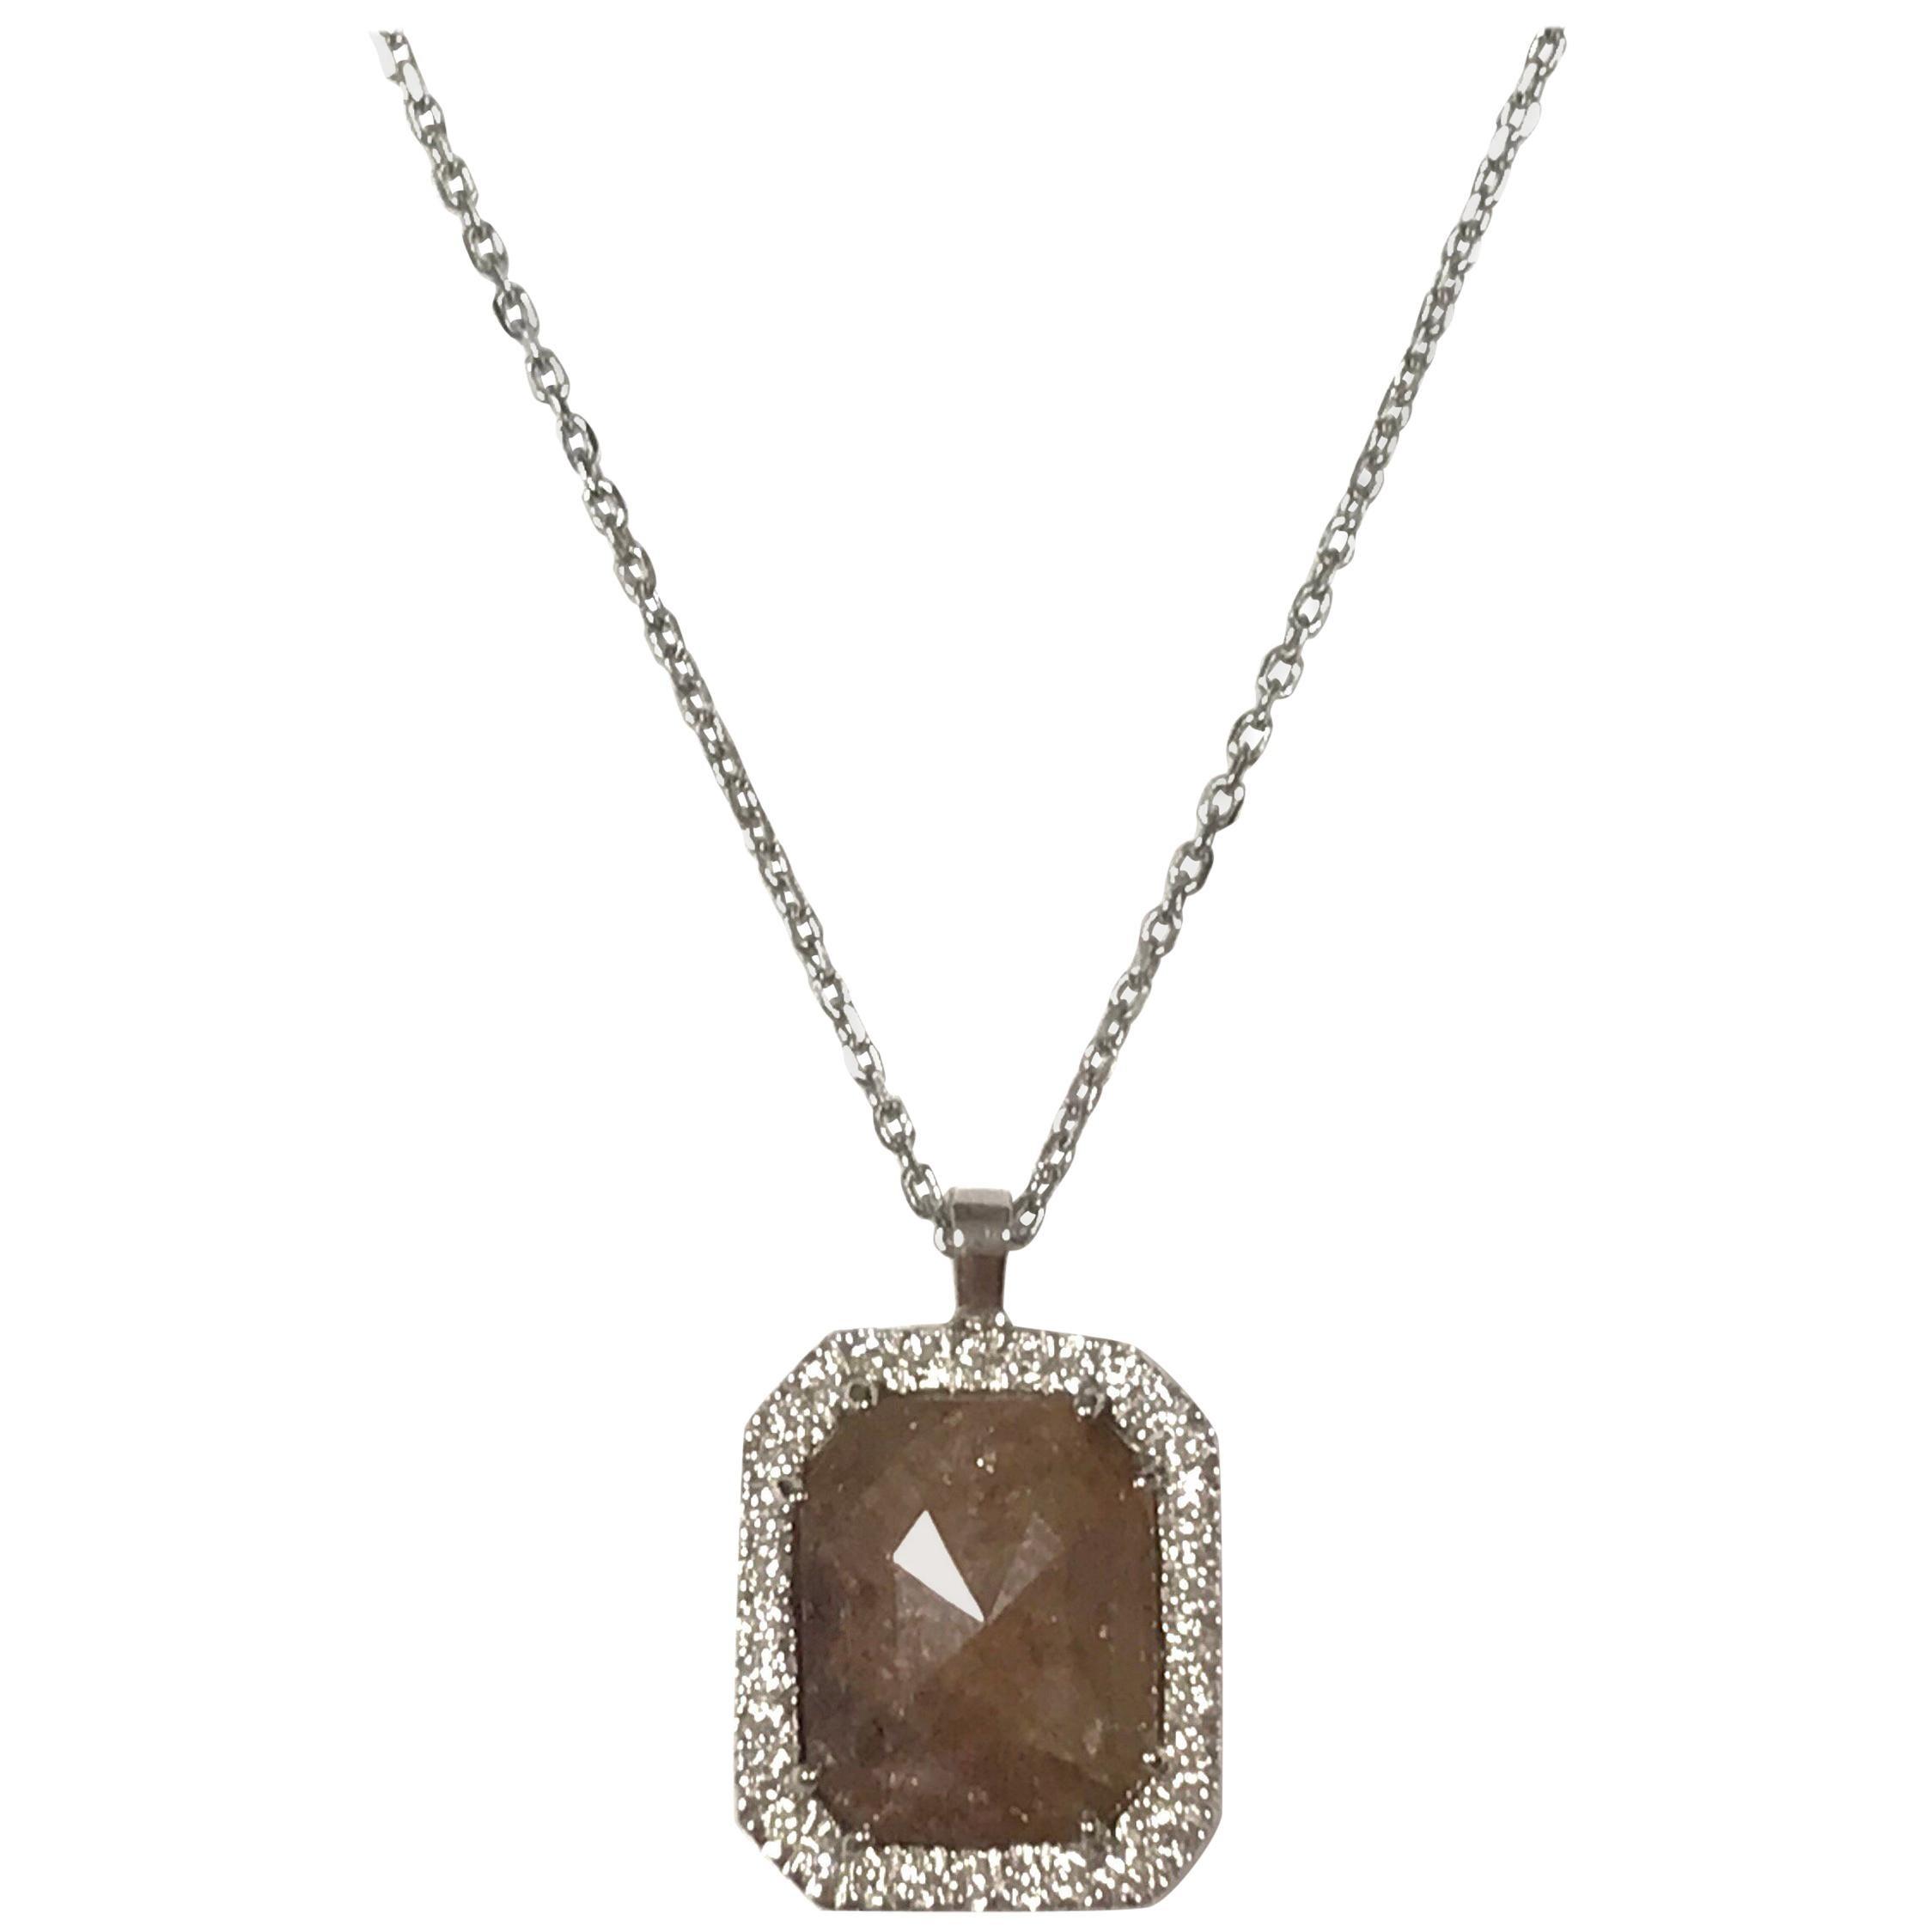 Colored Diamond and White Diamonds on White Gold 18 Karat Pendant Necklace